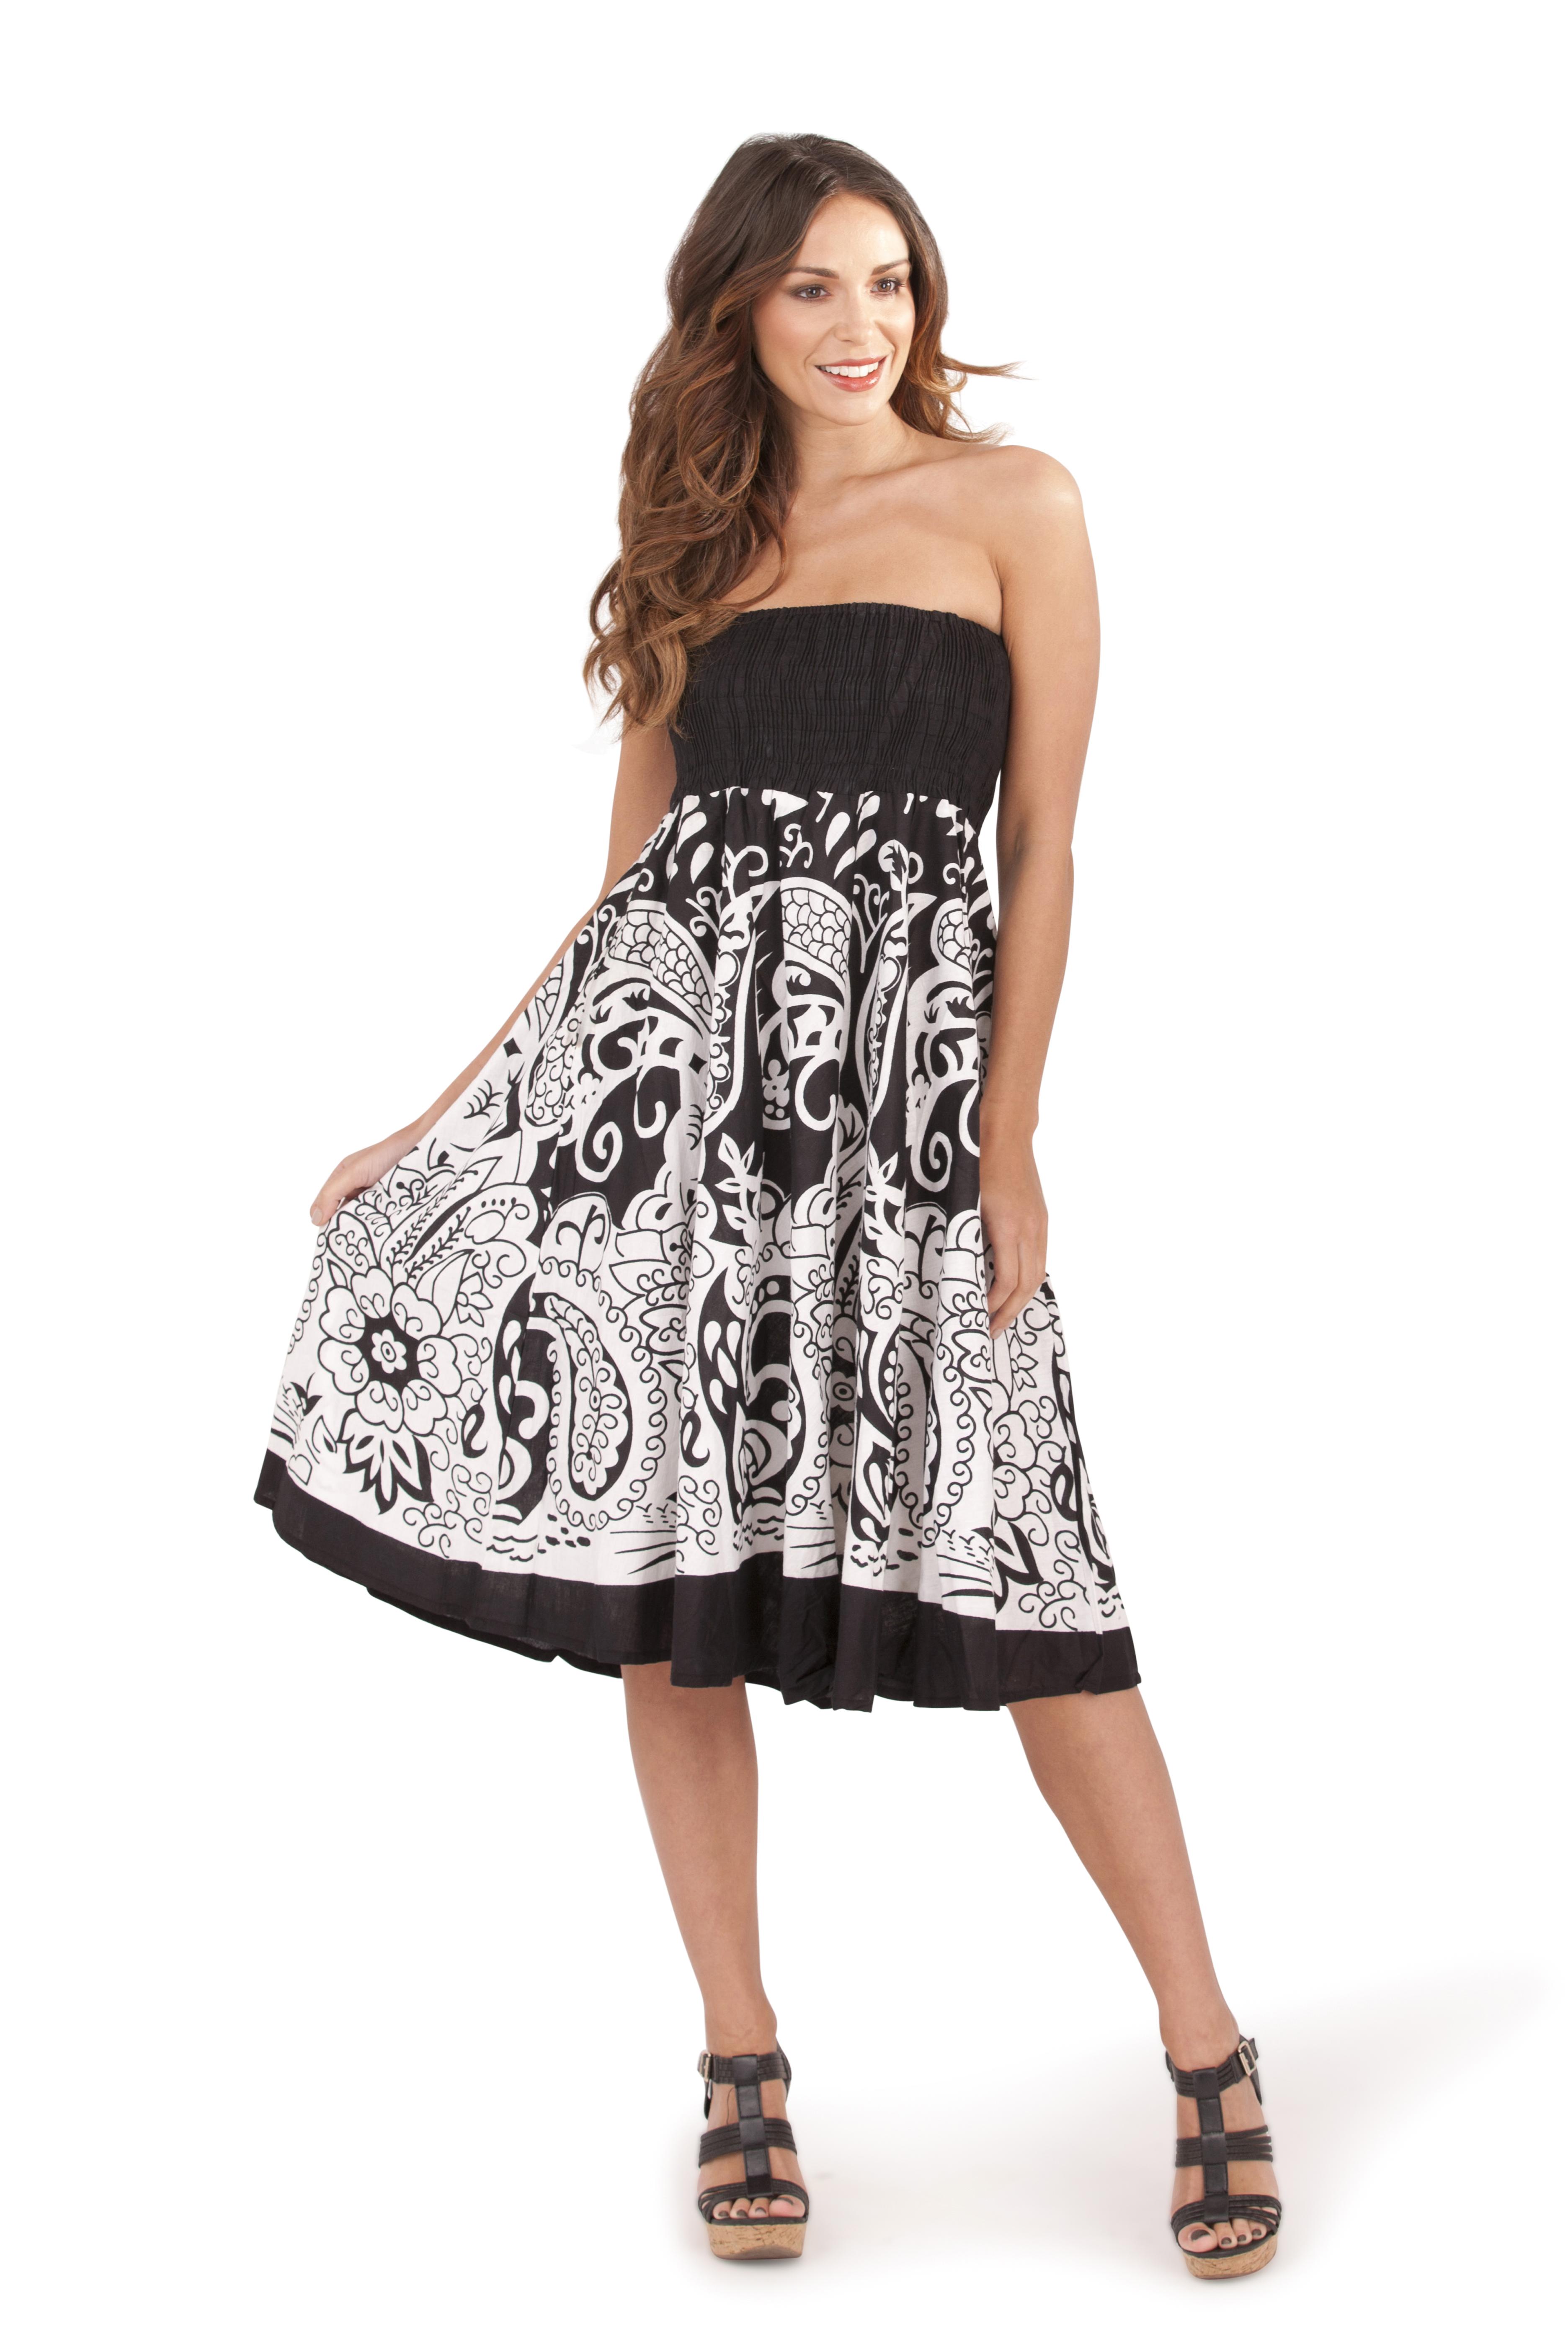 Model NEW Women Red Multi Color Summer Beaded Maxi Halter Long DRESS Juniors S M L | EBay